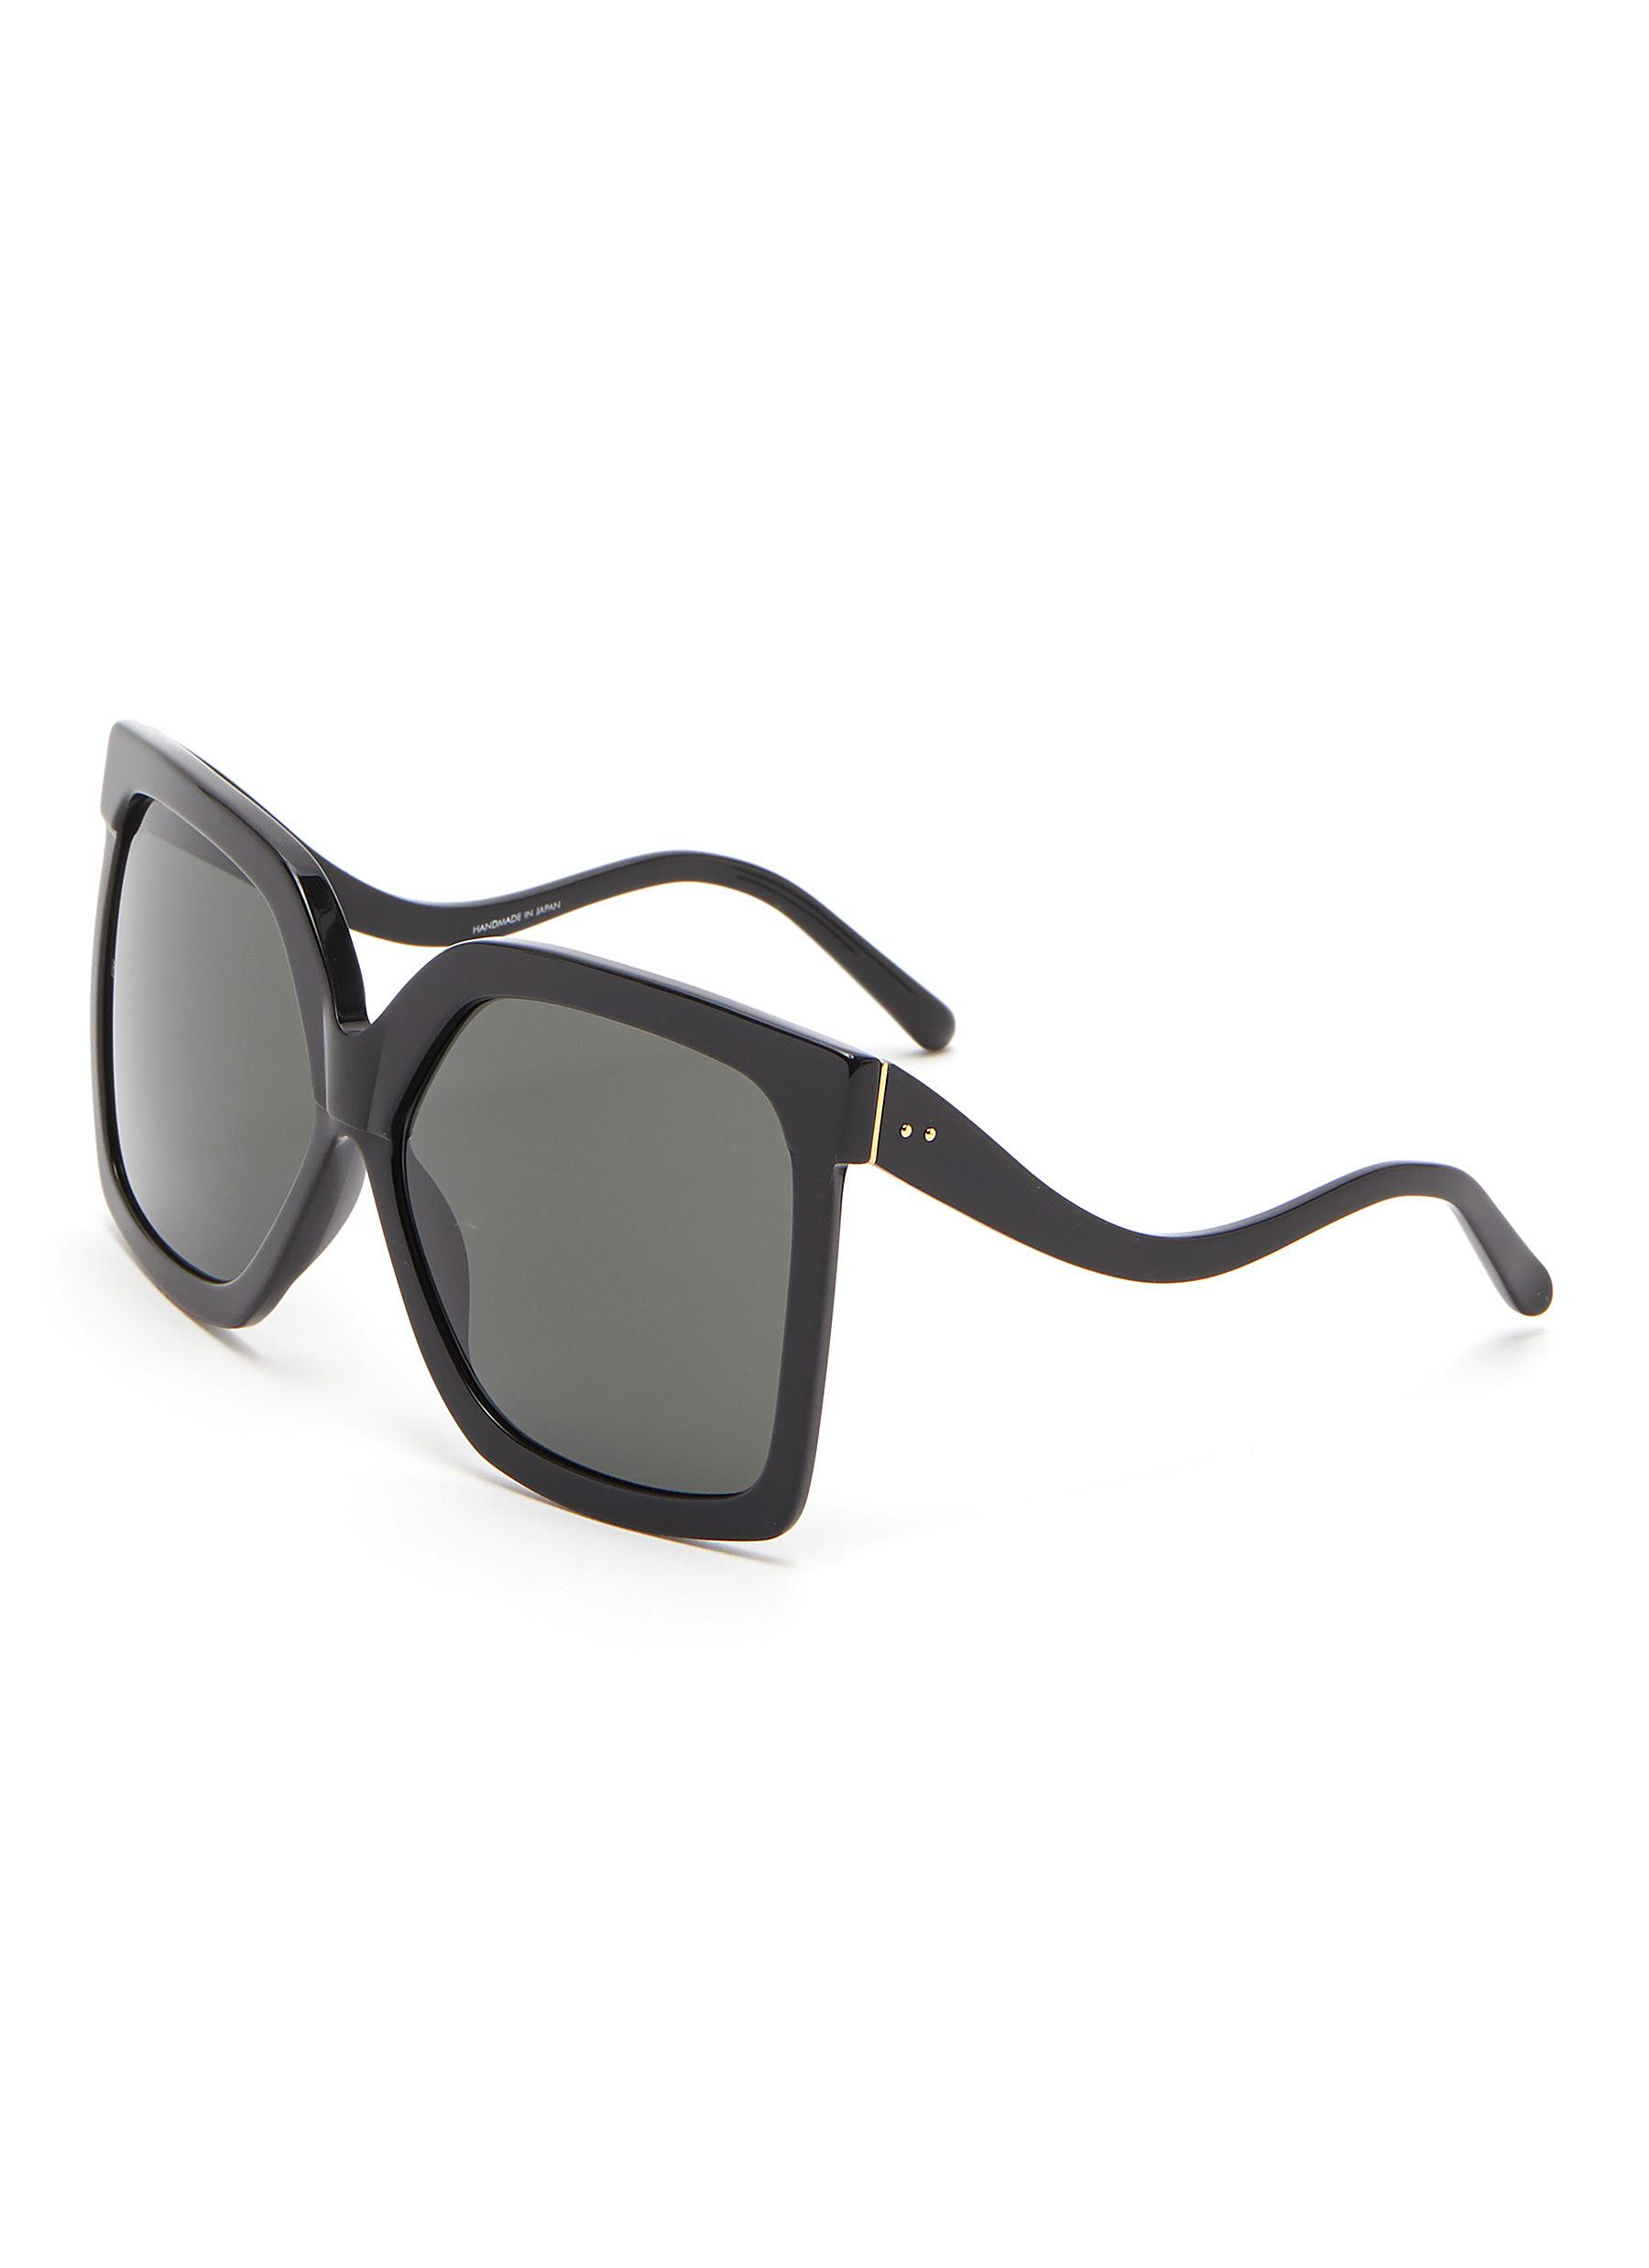 Linda Farrow ''Dare C1' Acetate Curve Temple Oversized Square Sunglasses